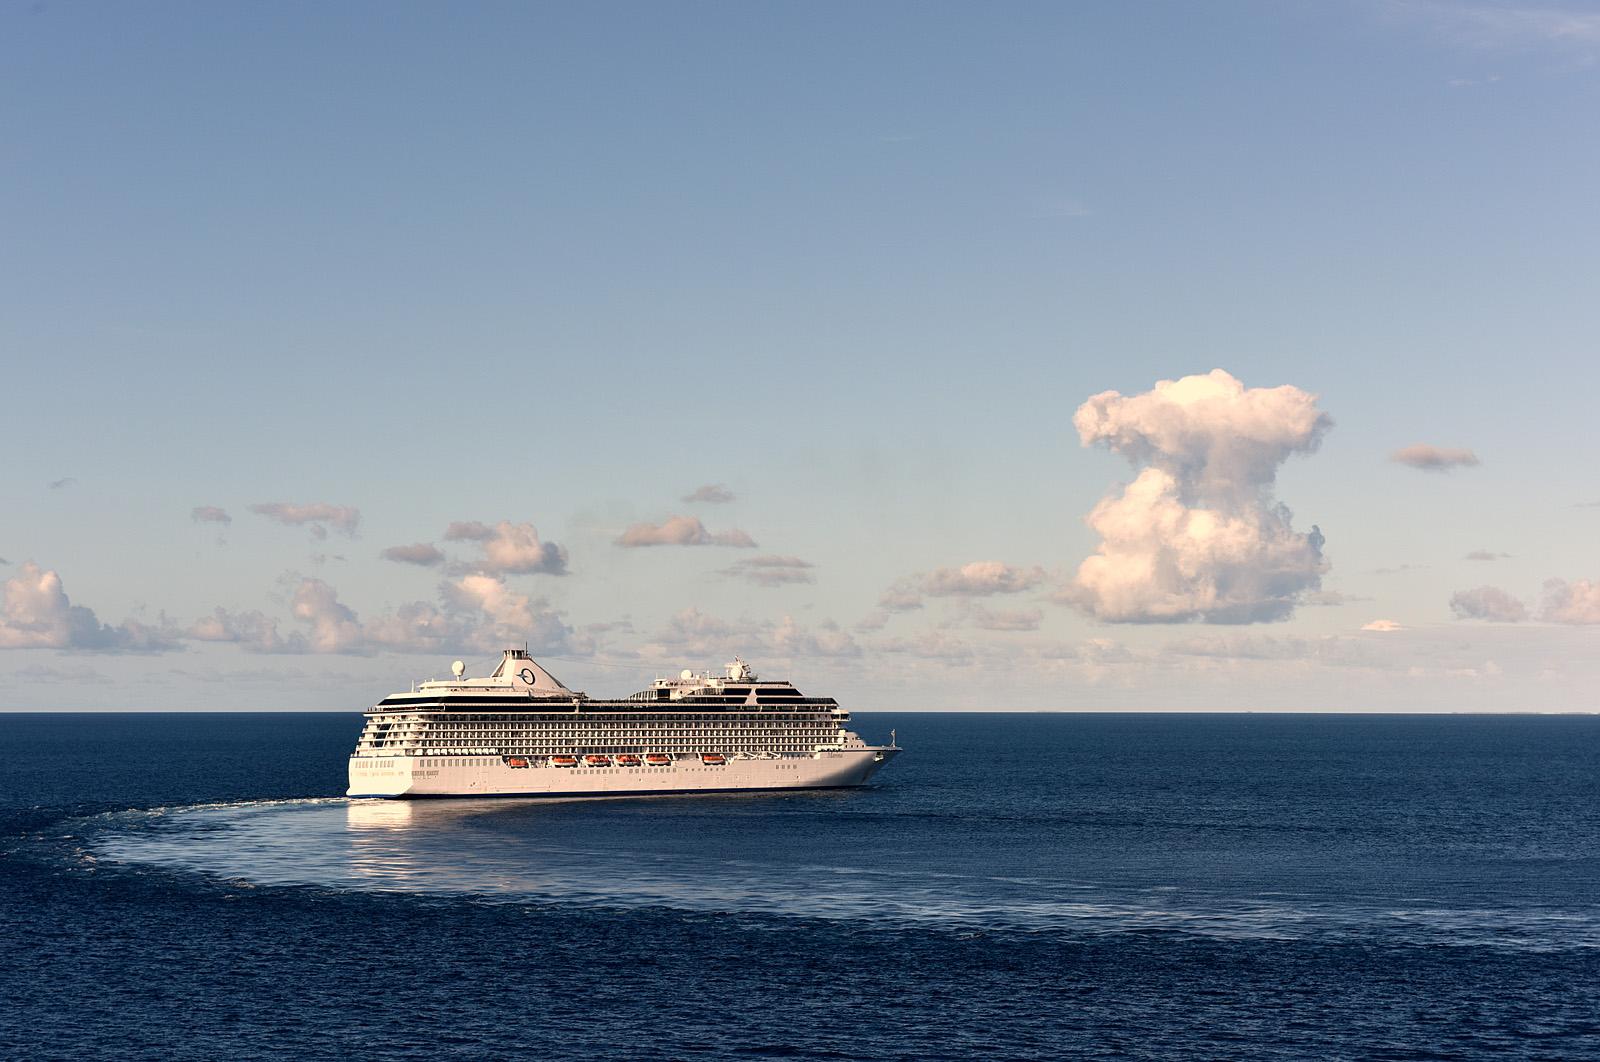 the arrival in Avatoru, Rangiroa, French Polynesia...